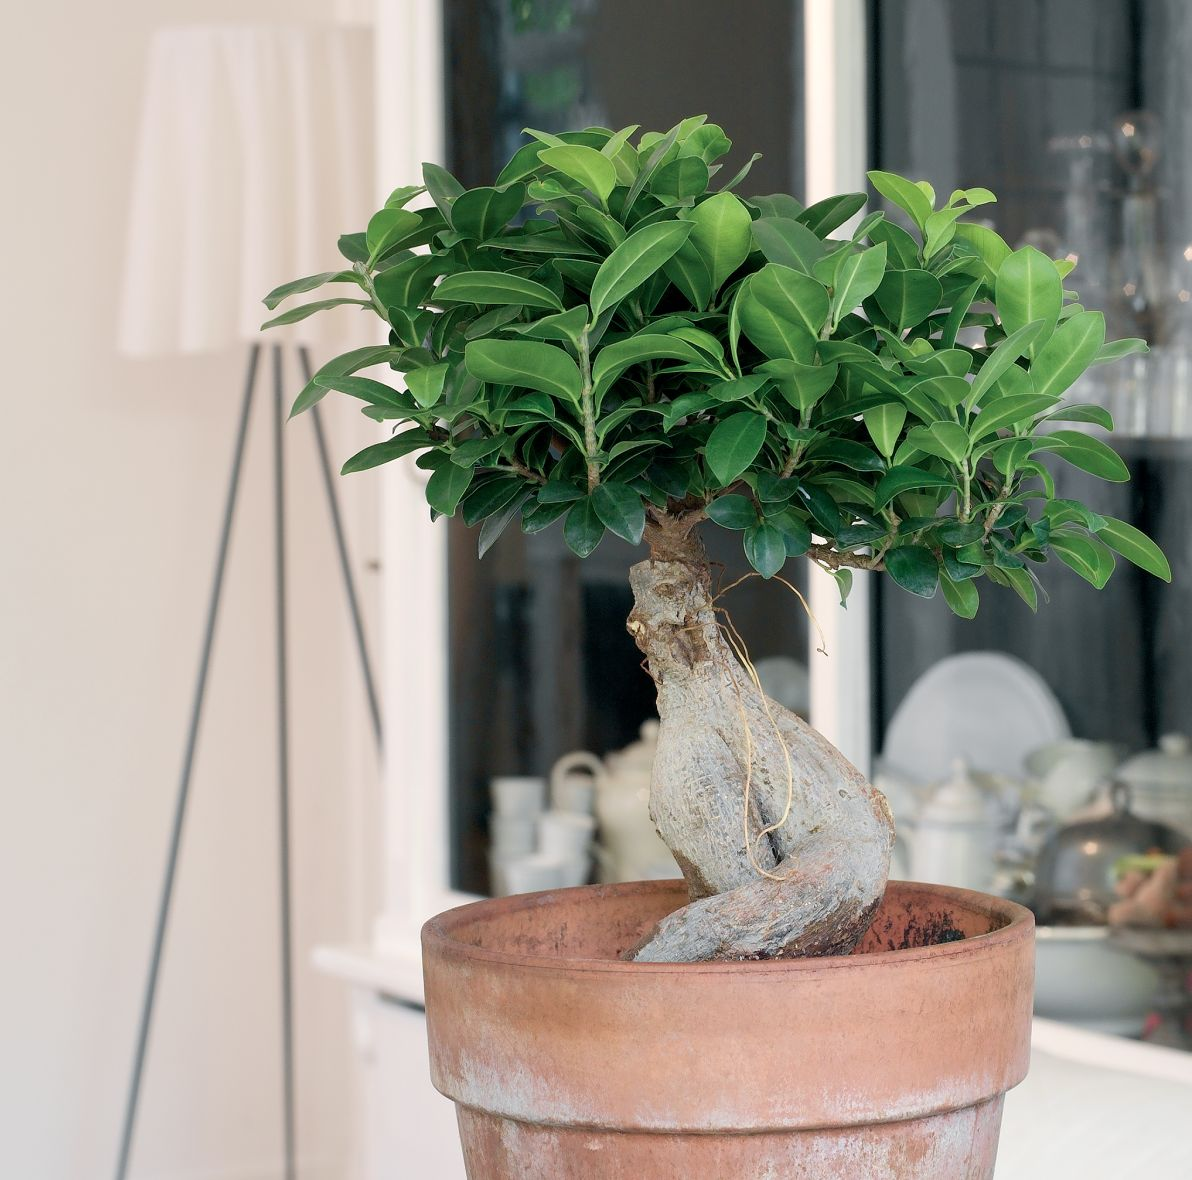 Bonsai Ficus Ginseng Modna Roślina Do Domu Jak